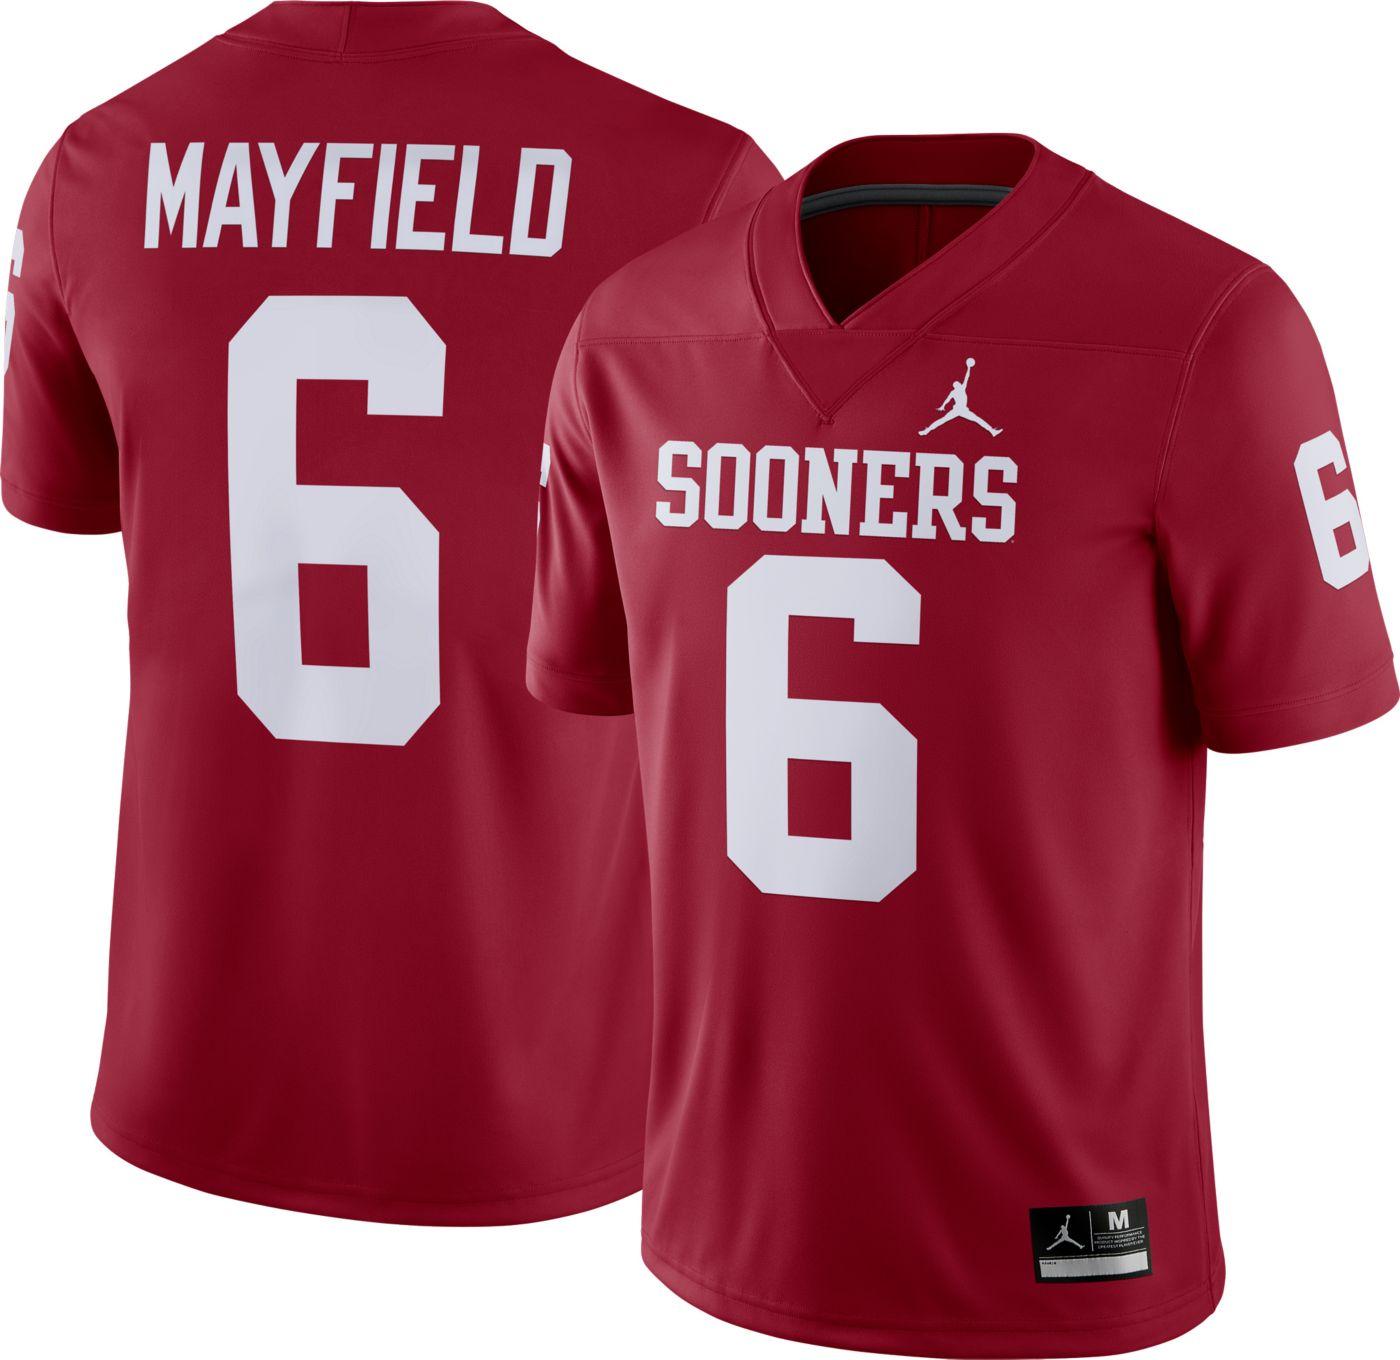 Jordan Men's Baker Mayfield Oklahoma Sooners #6 Crimson Dri-FIT Game Football Jersey